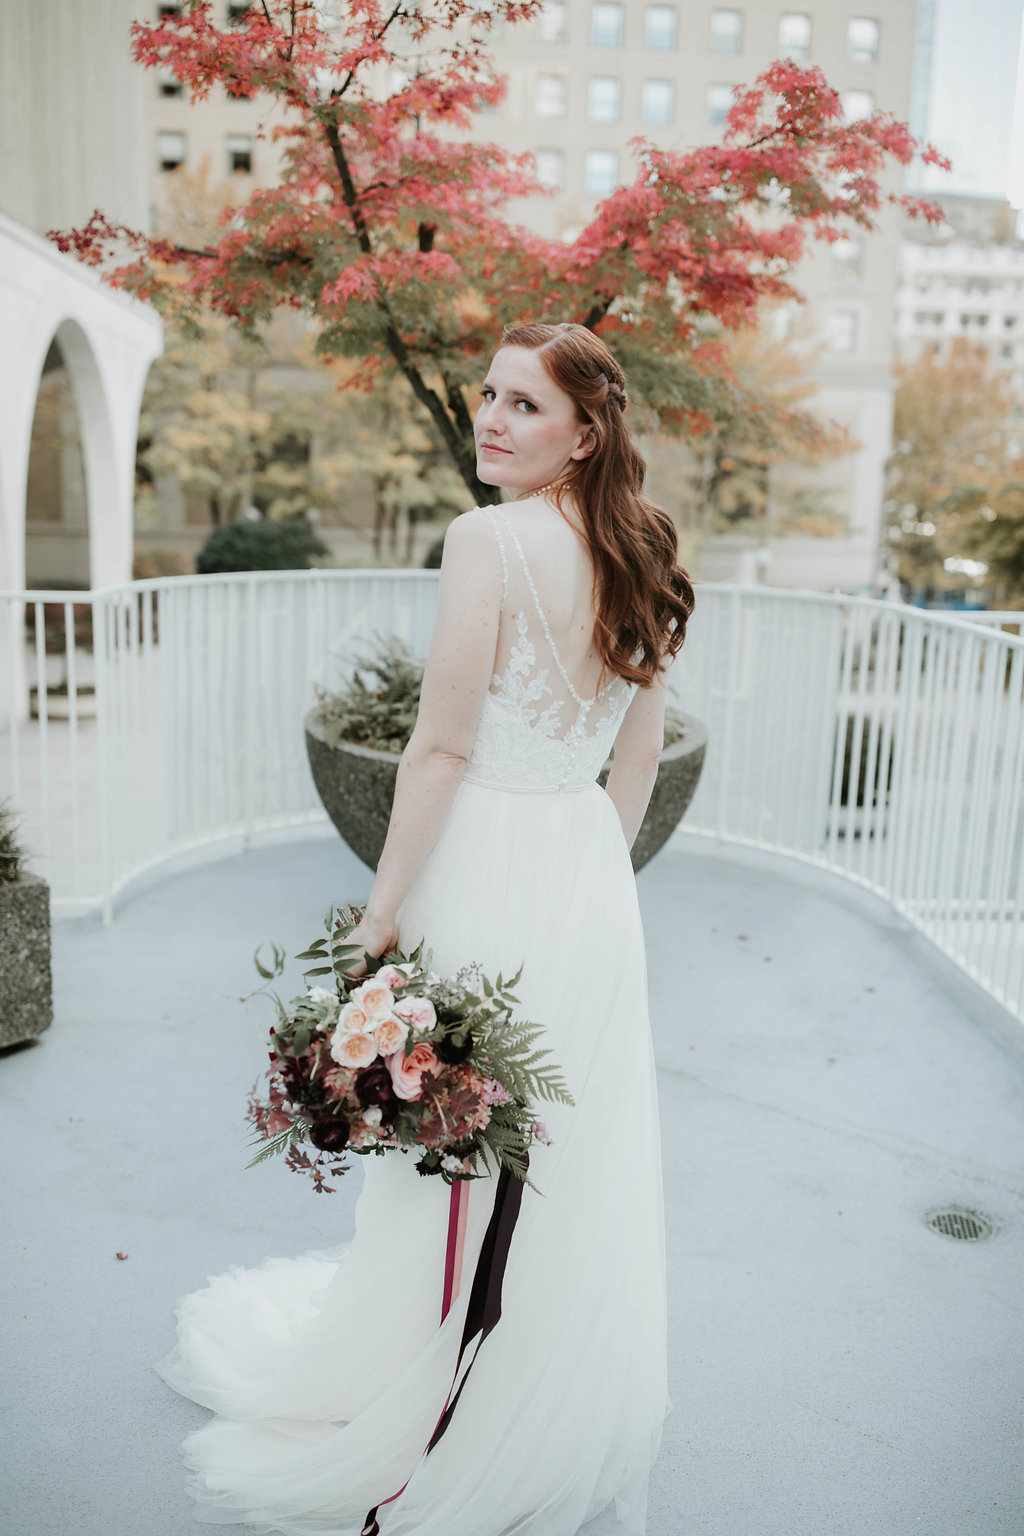 Lily+Jonathan_Fairmont_Olympic_hotel_wedding_Seattle_wedding_photographer_261.JPG